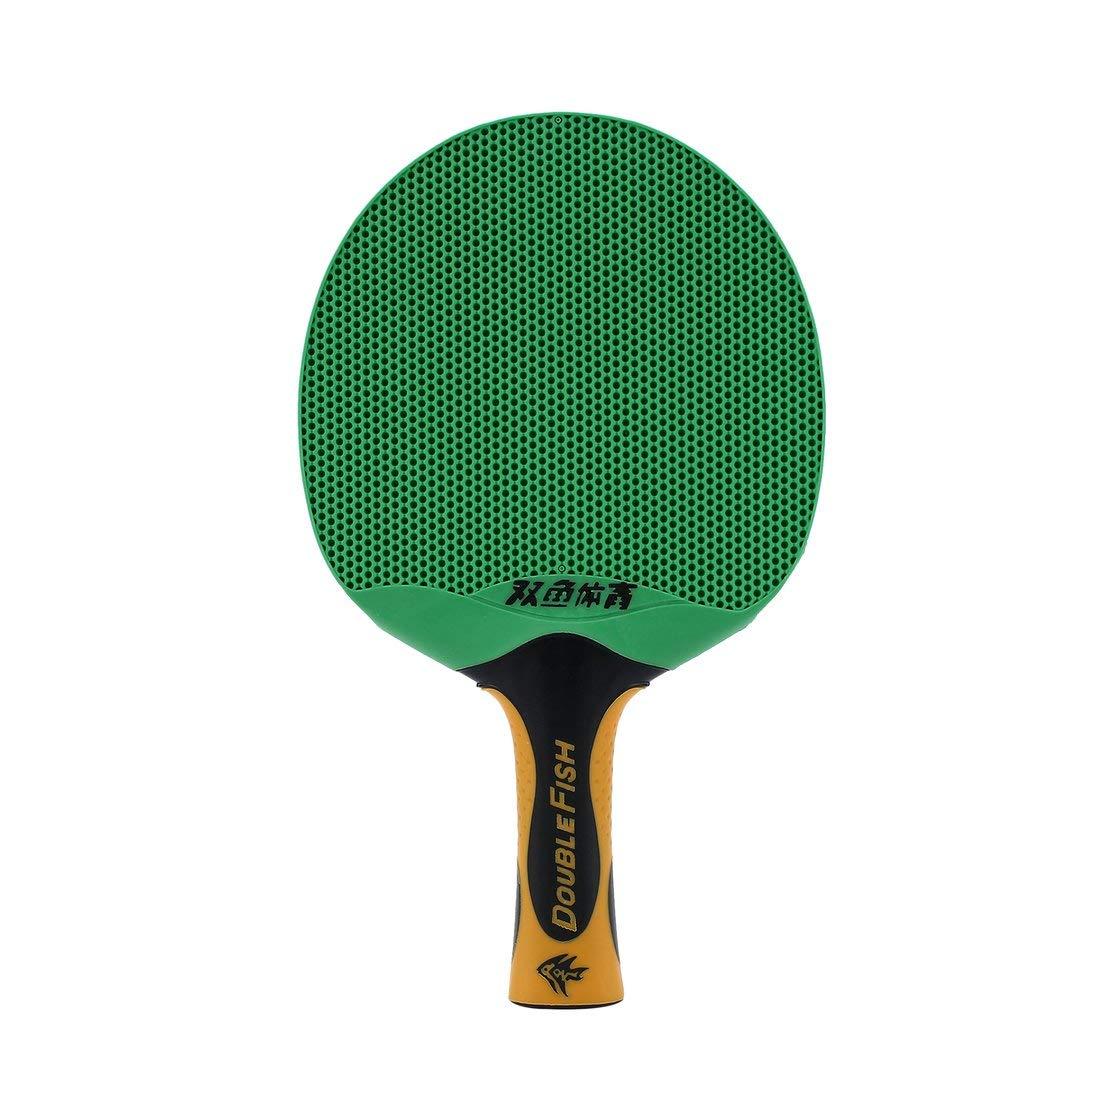 Doble Pescado Deportes al Aire Libre para Interiores Tenis Impermeable para Tenis de Mesa Portátil Durable Caucho Plástico Ping-Pong Paleta Laurelmartina